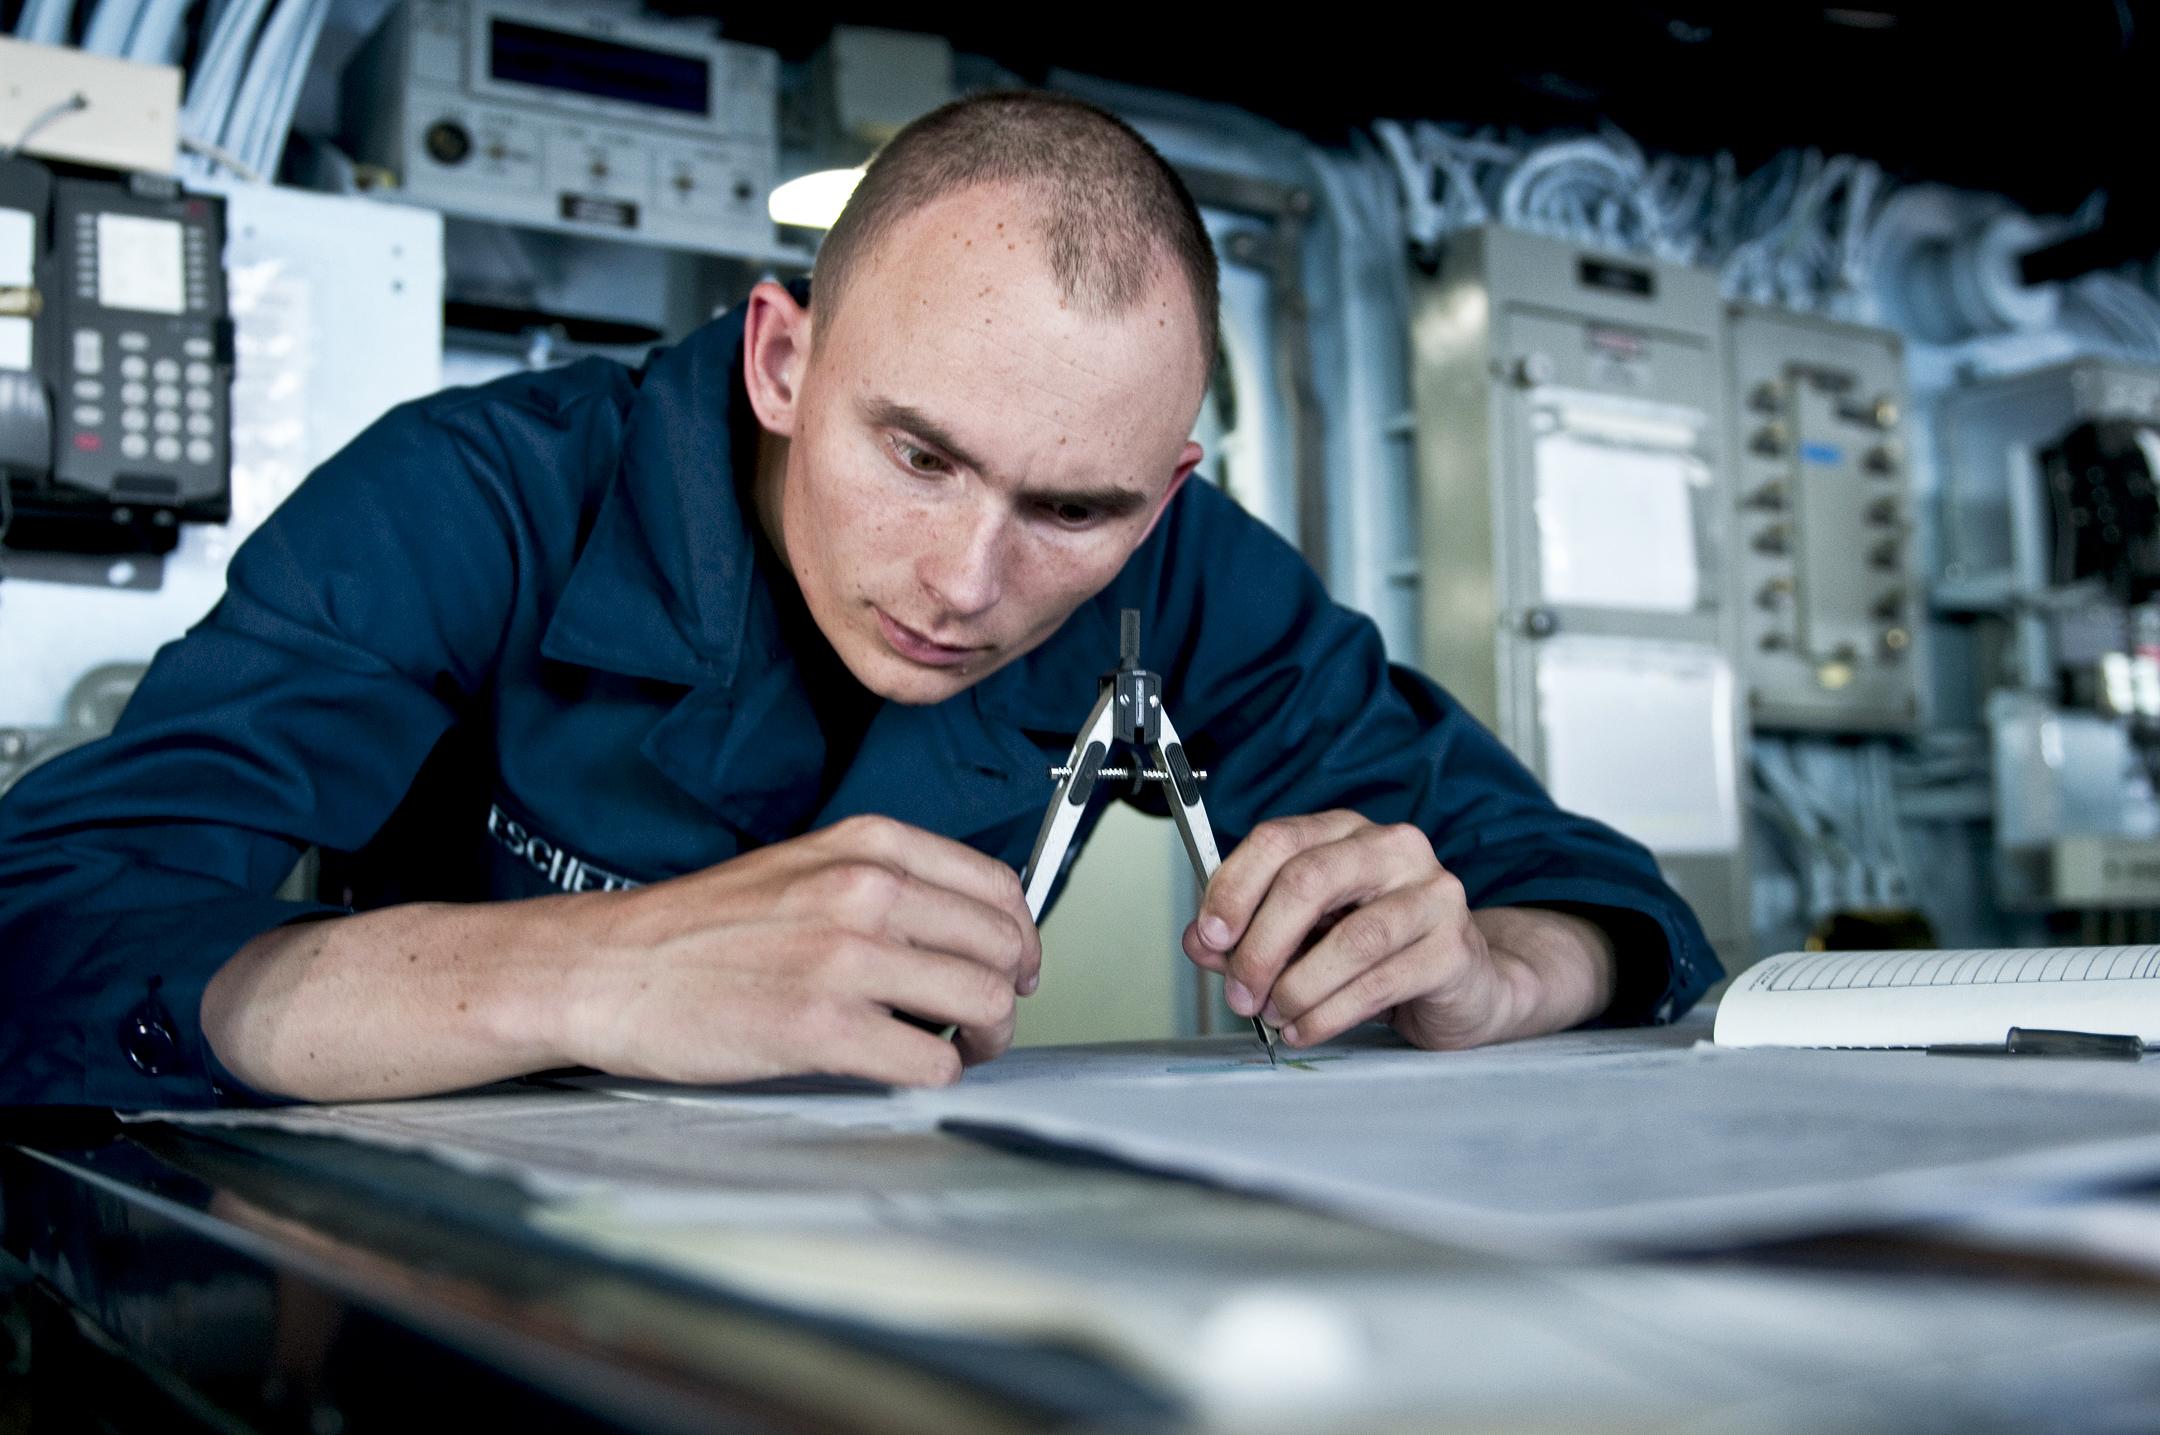 navy seaman michael eschete tracks course of the amphibious assault ship uss wasp as it departs